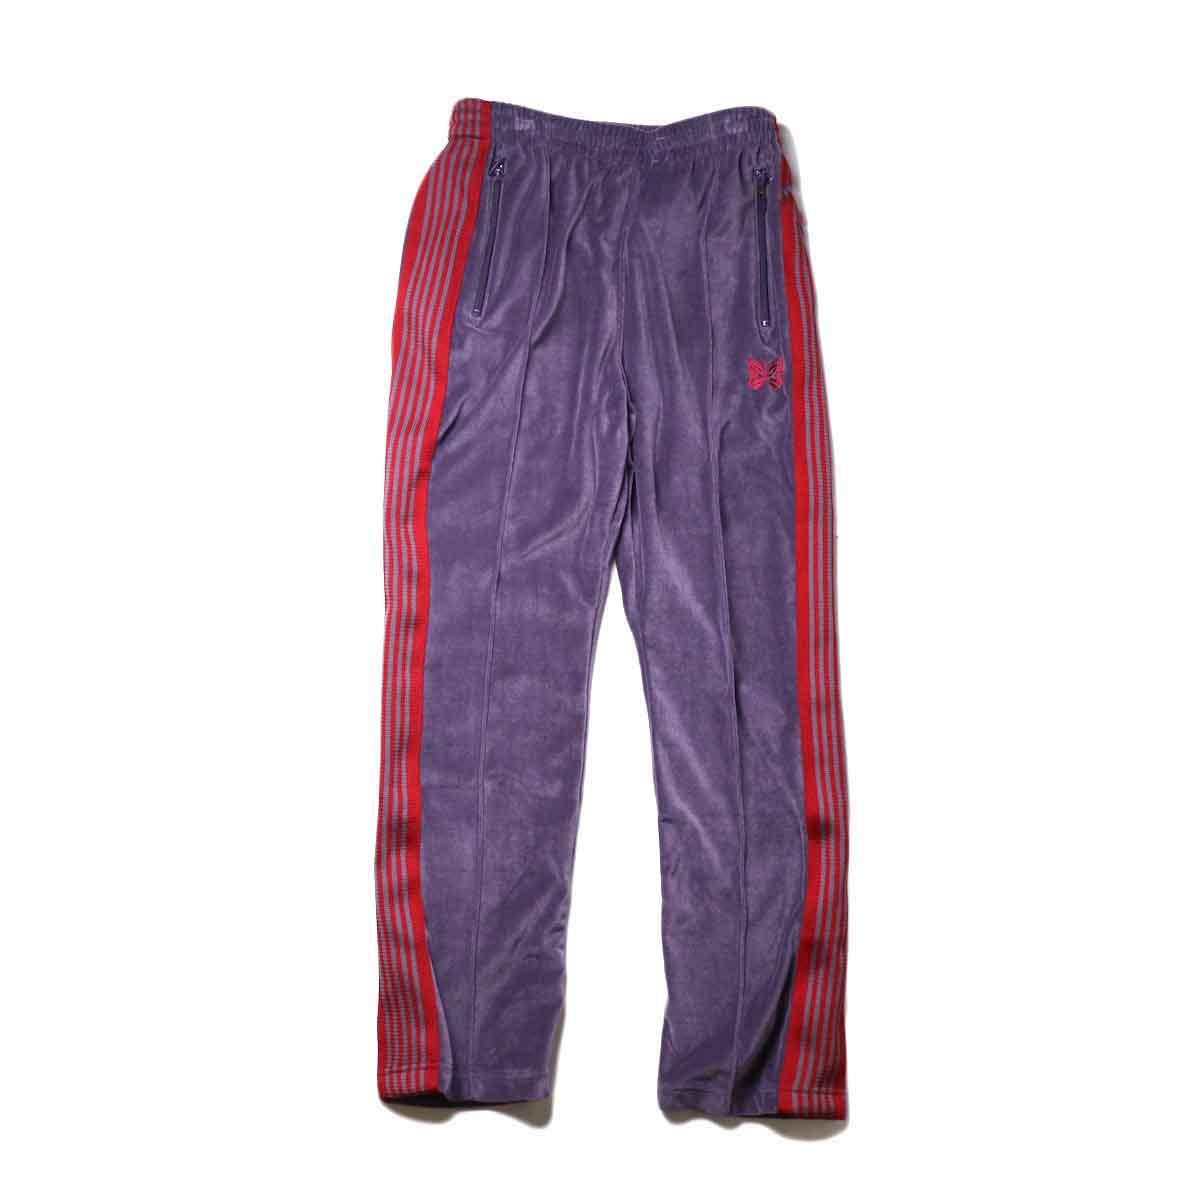 Needles / Narrow Track Pant -C/Pe Velour (Purple)